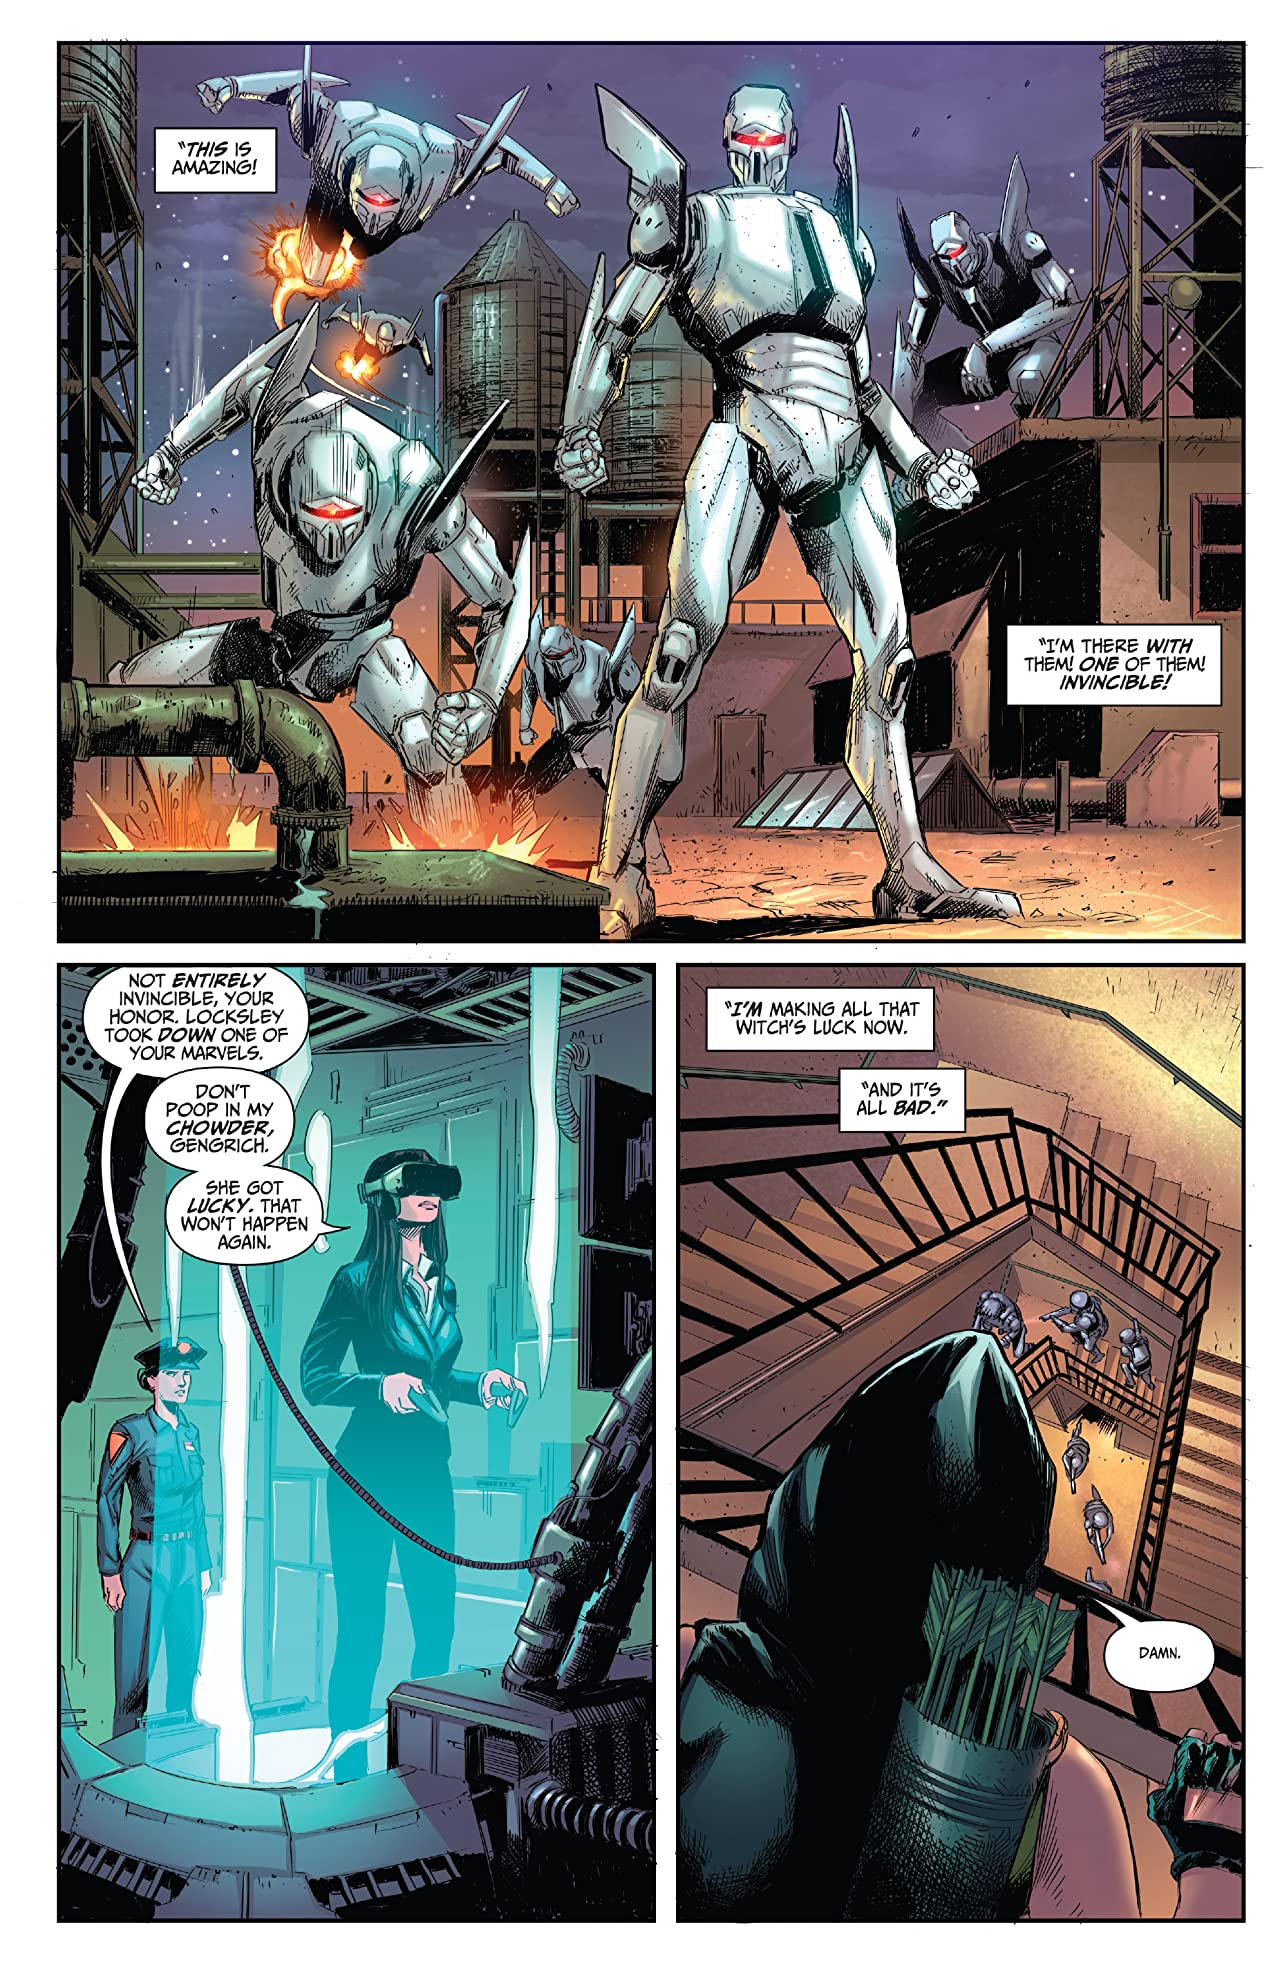 Robyn Hood #2: Justice